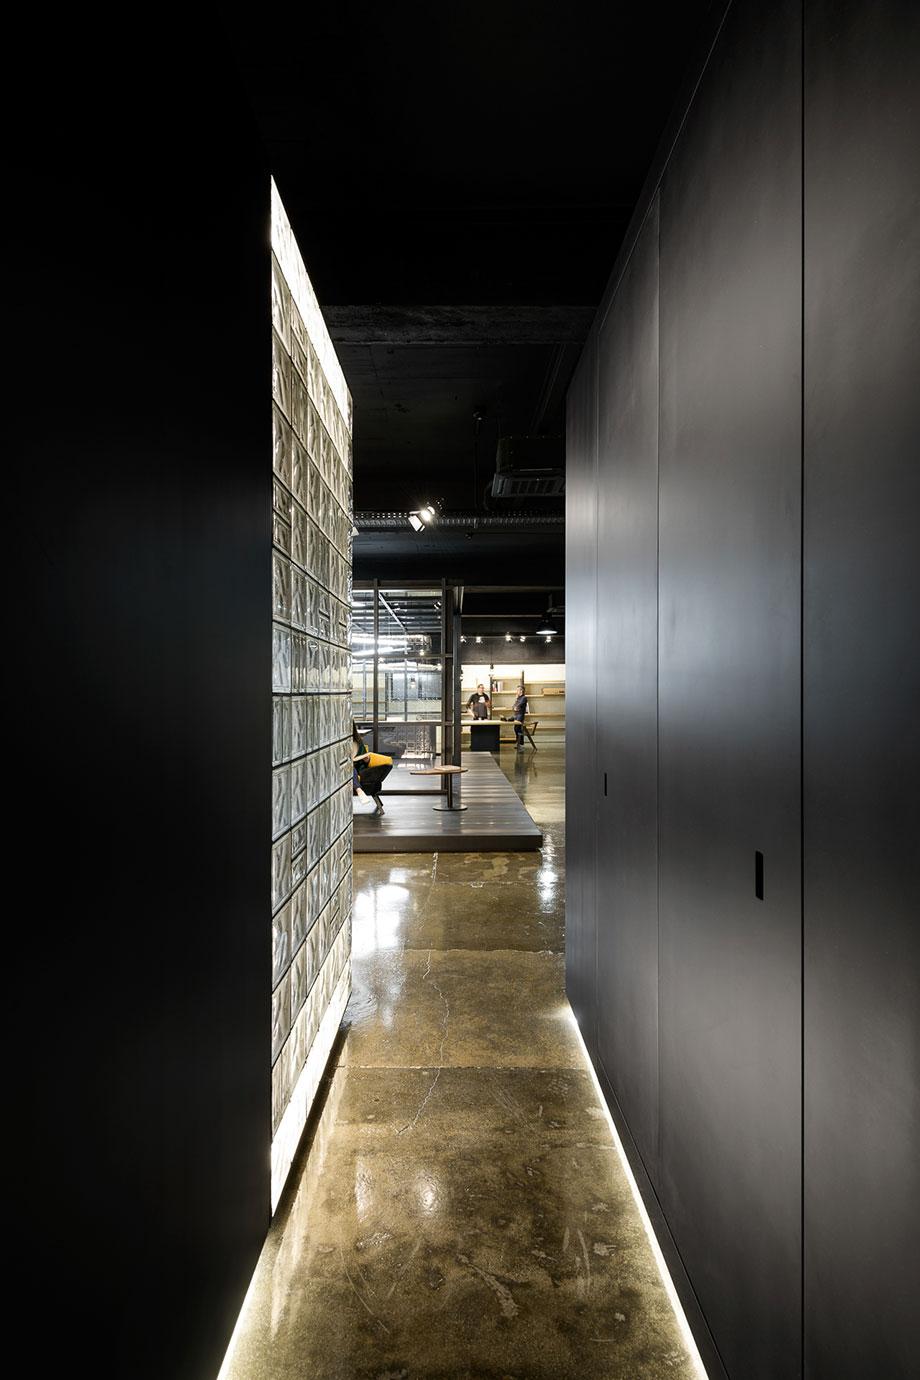 atelier das artes 16 de mmvarquitectos (6) - foto ricardo oliveira alves